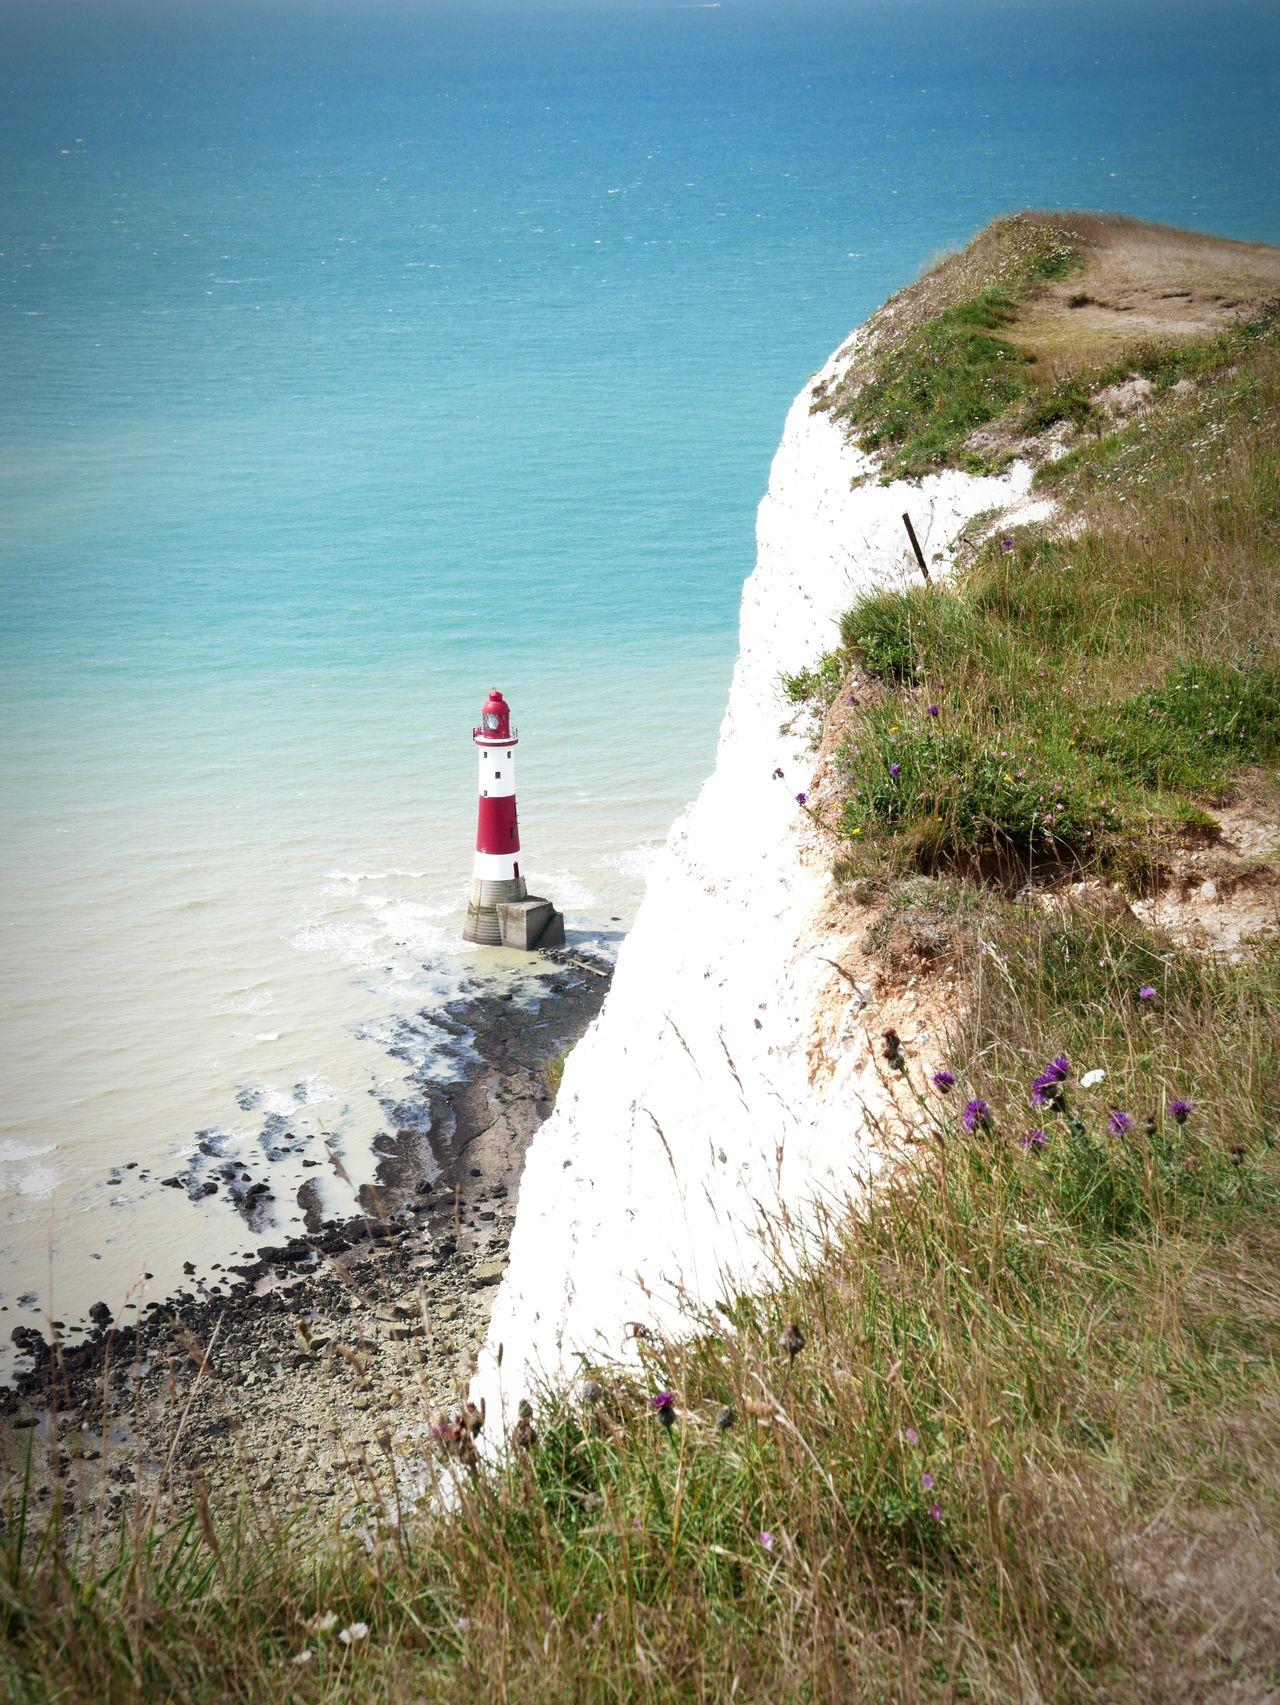 Cliff Sea Sea And Sky Seaside Seascape Beach Beachy Head Uk England Uk Coastline Headlight Red Eastbourne United Kingdom